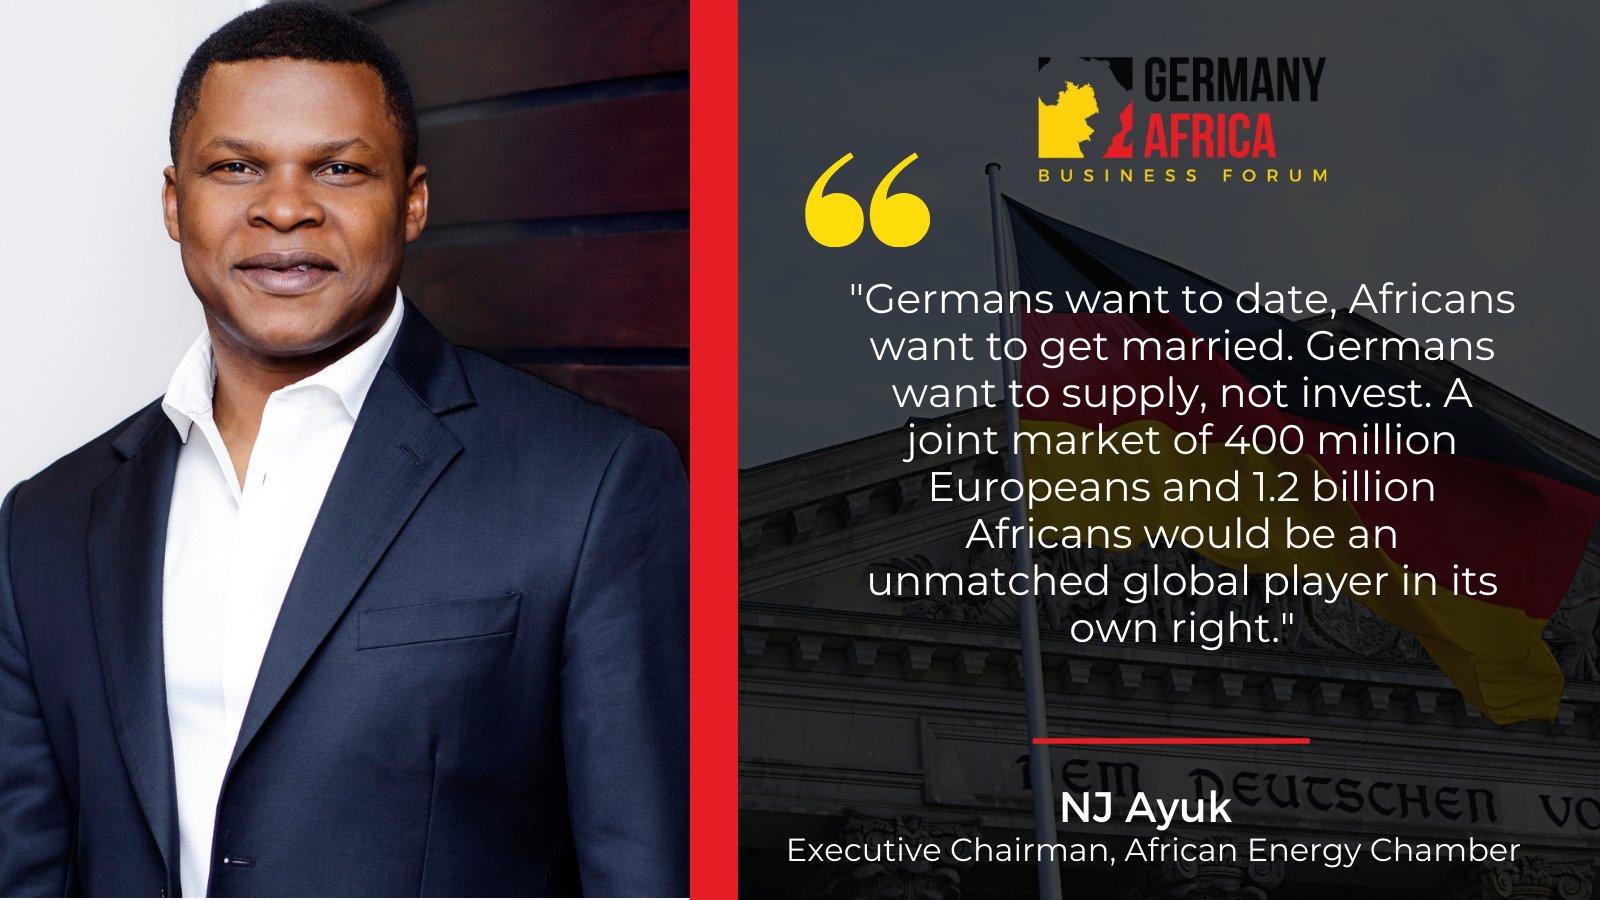 NJ Ayuk, Executive Chairman of the African Energy Chamber